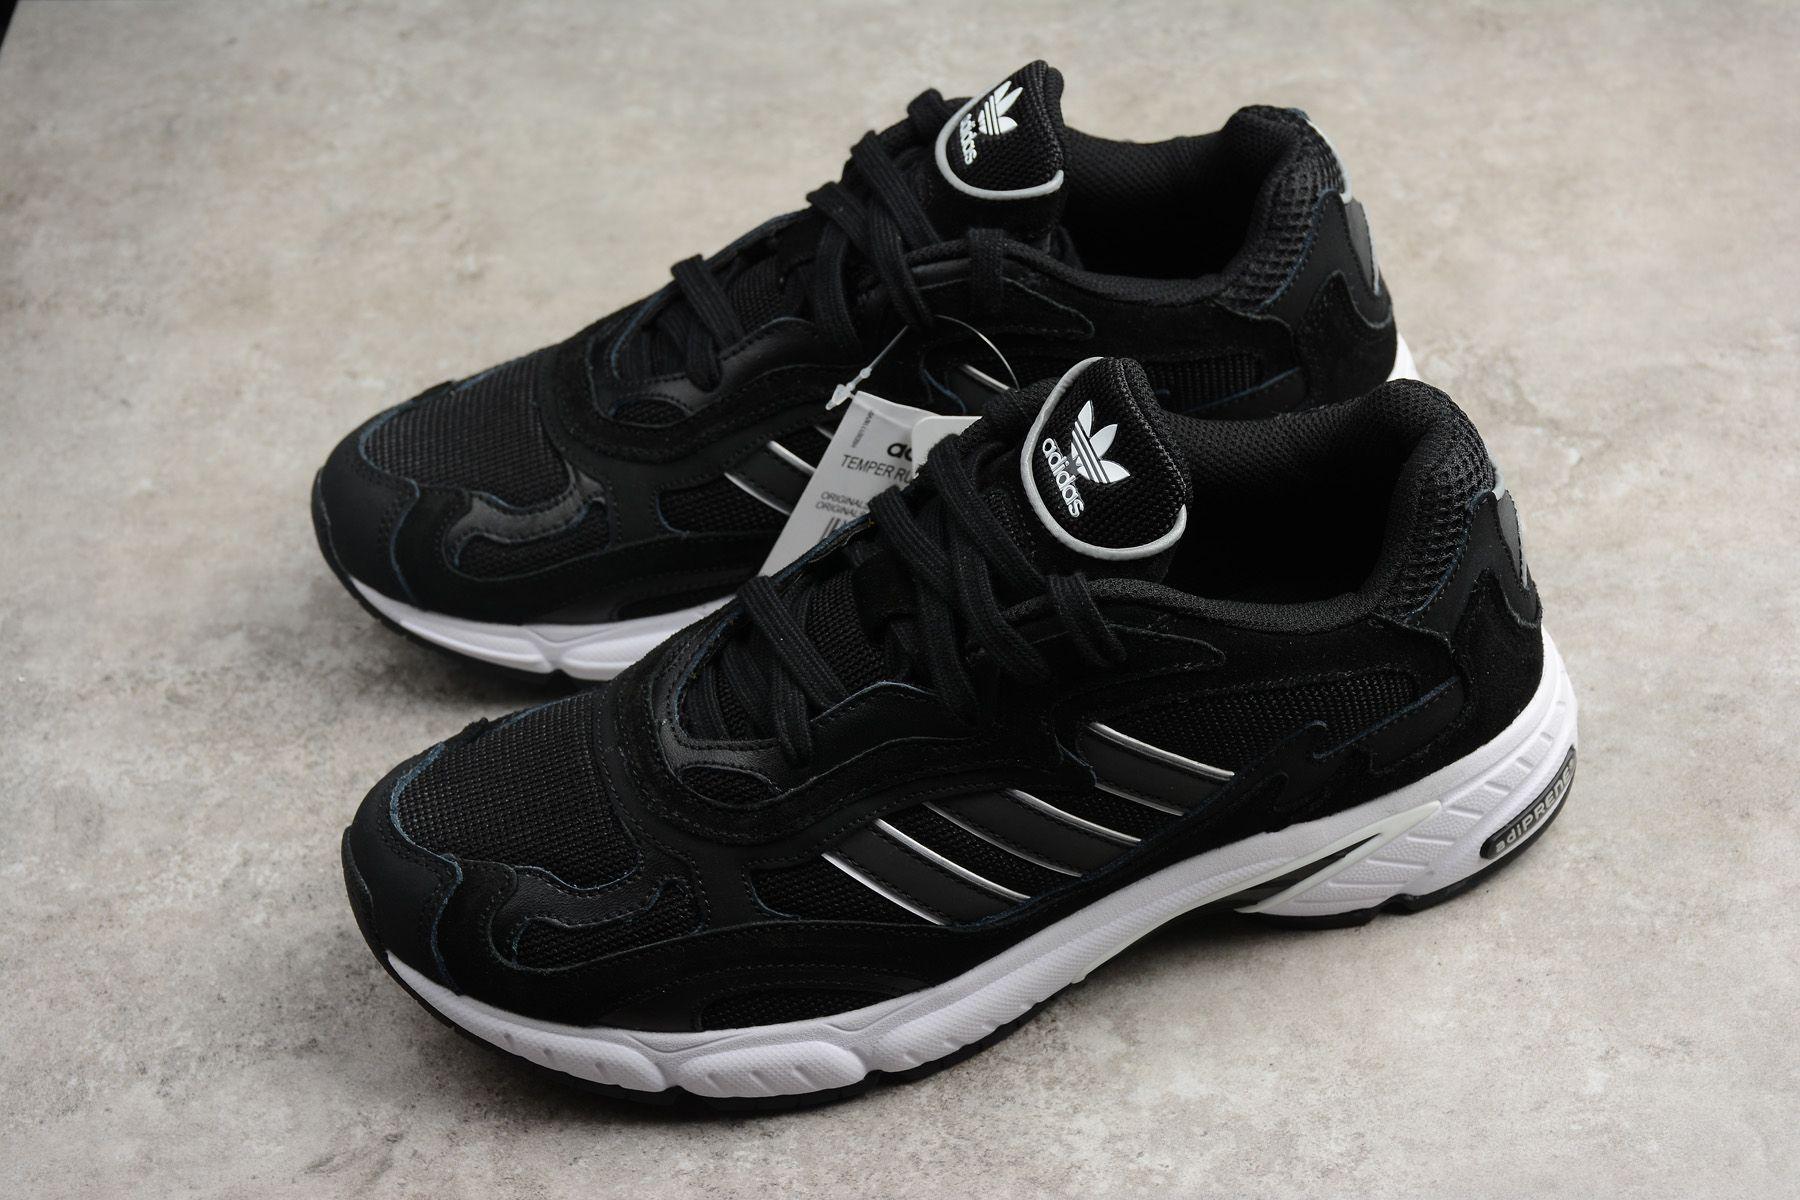 check out 69500 17105 New adidas Temper Run Black White F36311 For Sale